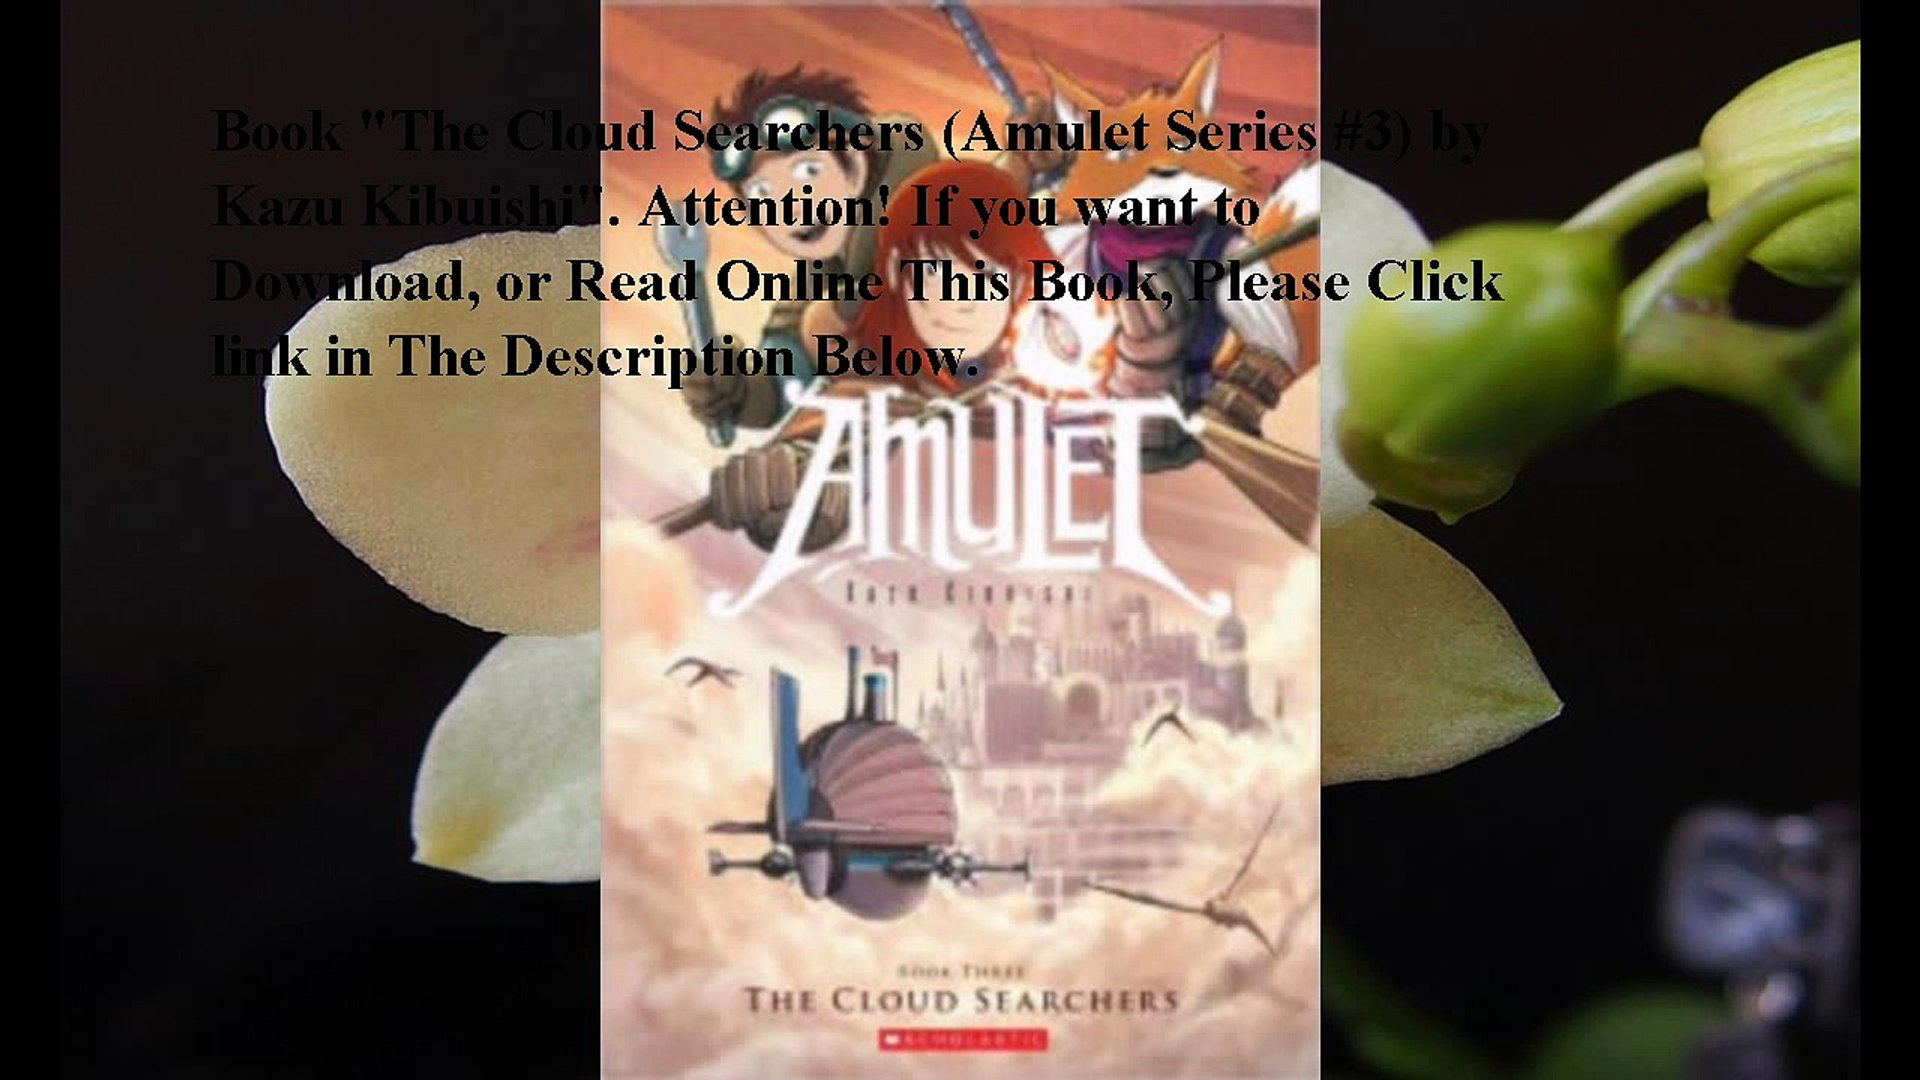 Download The Cloud Searchers (Amulet Series #3) ebook PDF